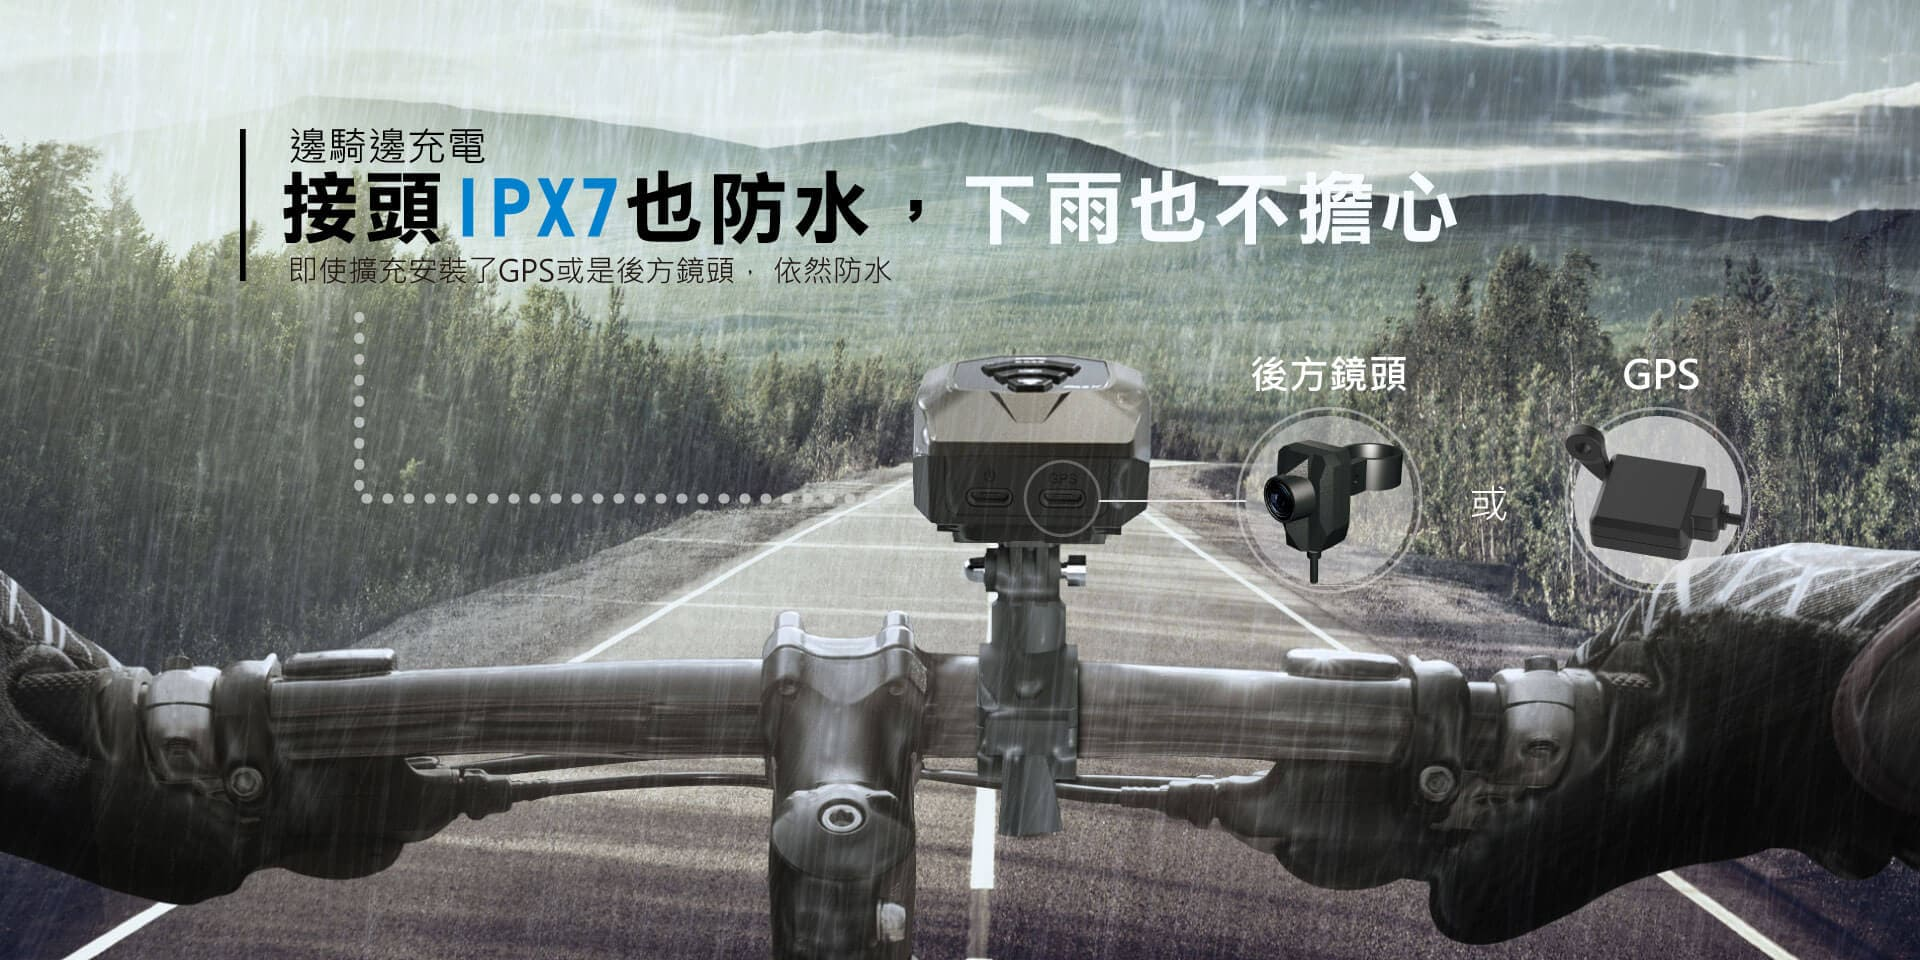 proimages/product/pro-01/pro-01-002/B52X/B52X-16.jpg